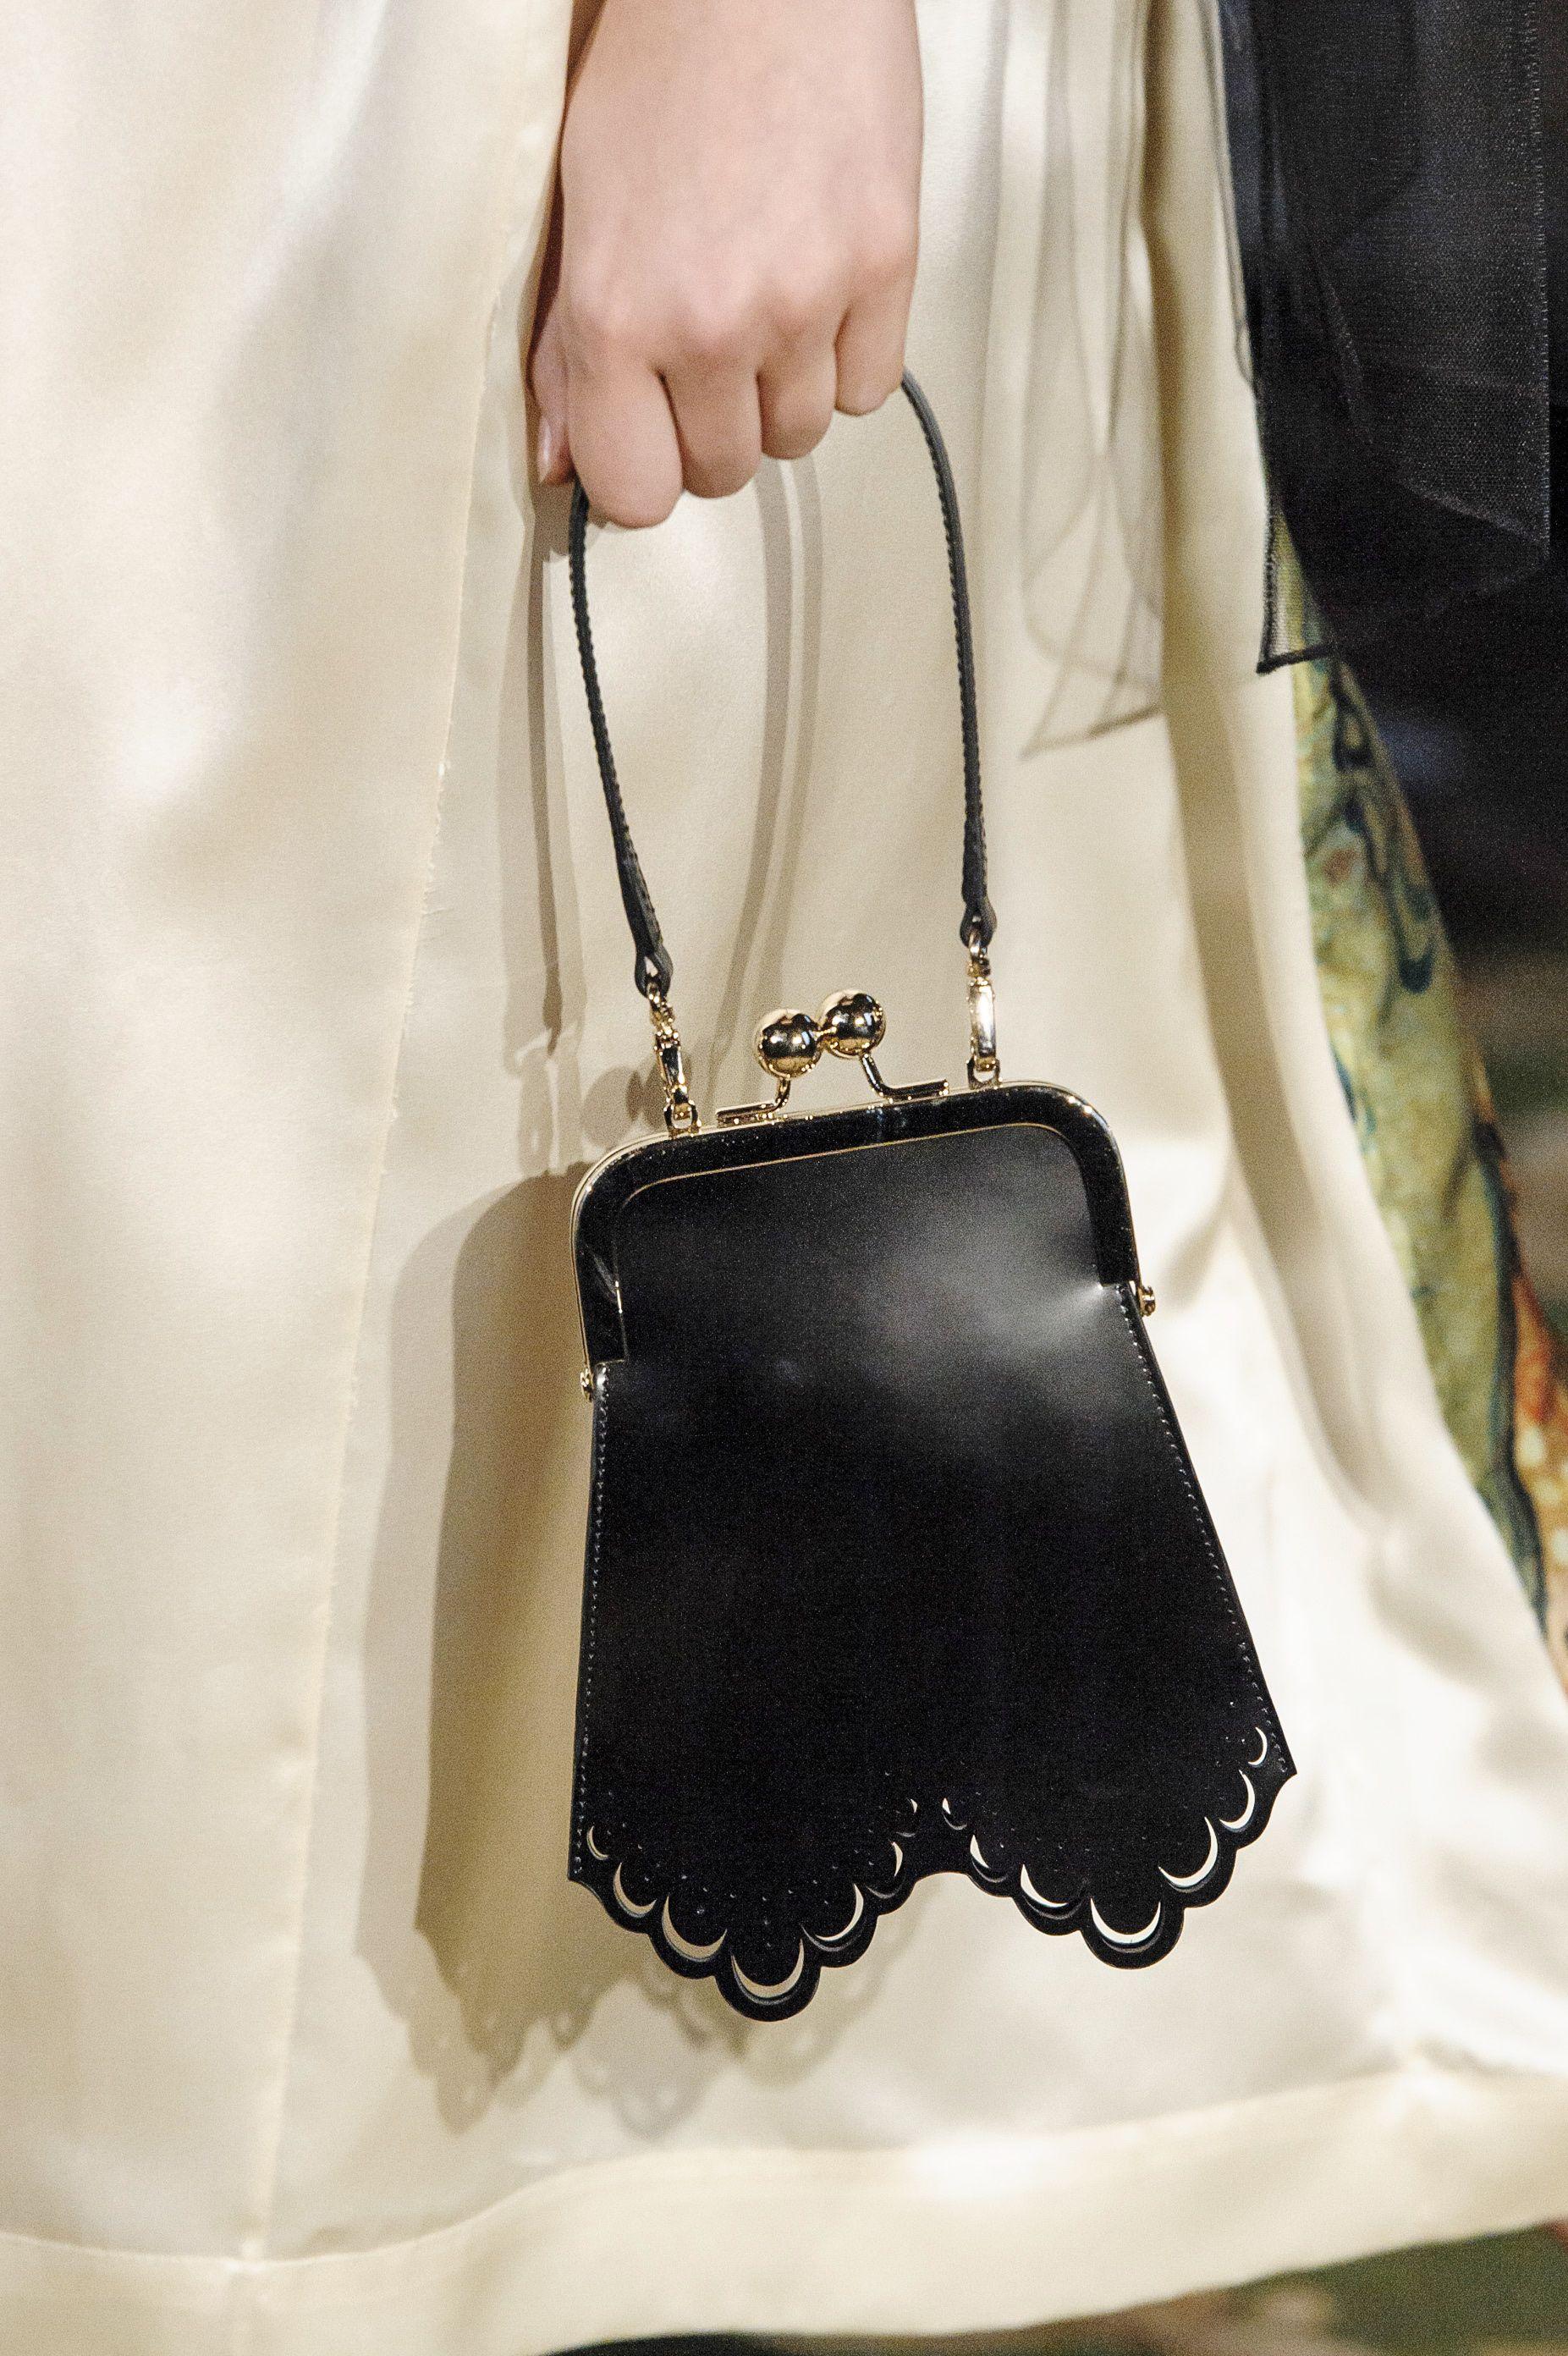 8adf0b7eb Handbag For Girls - Foto Handbag All Collections Salonagafiya.Com